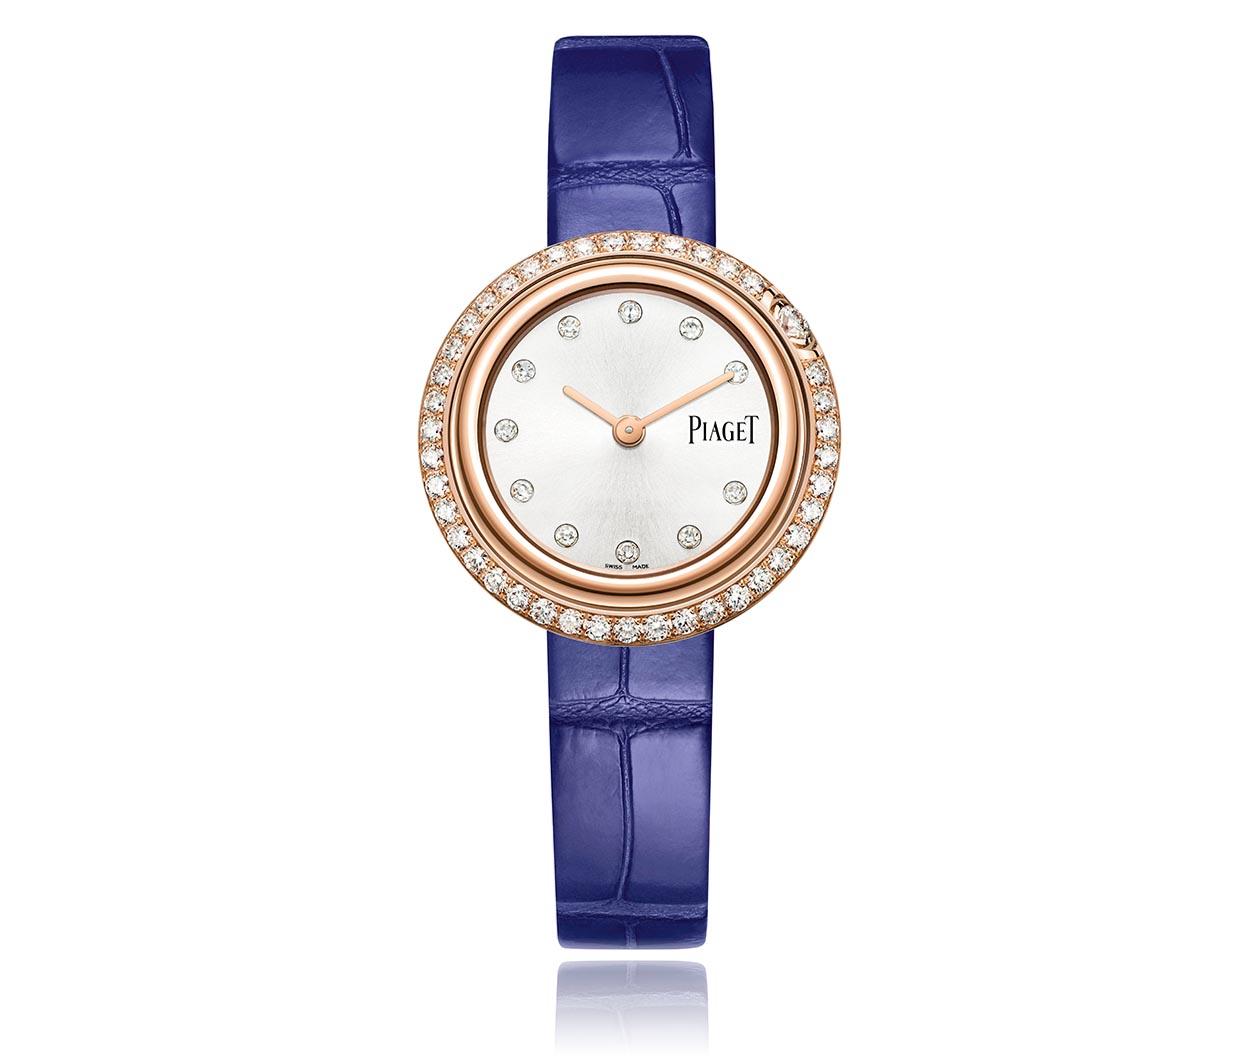 Piaget Possession watch G0A43082 Flatlay FINAL